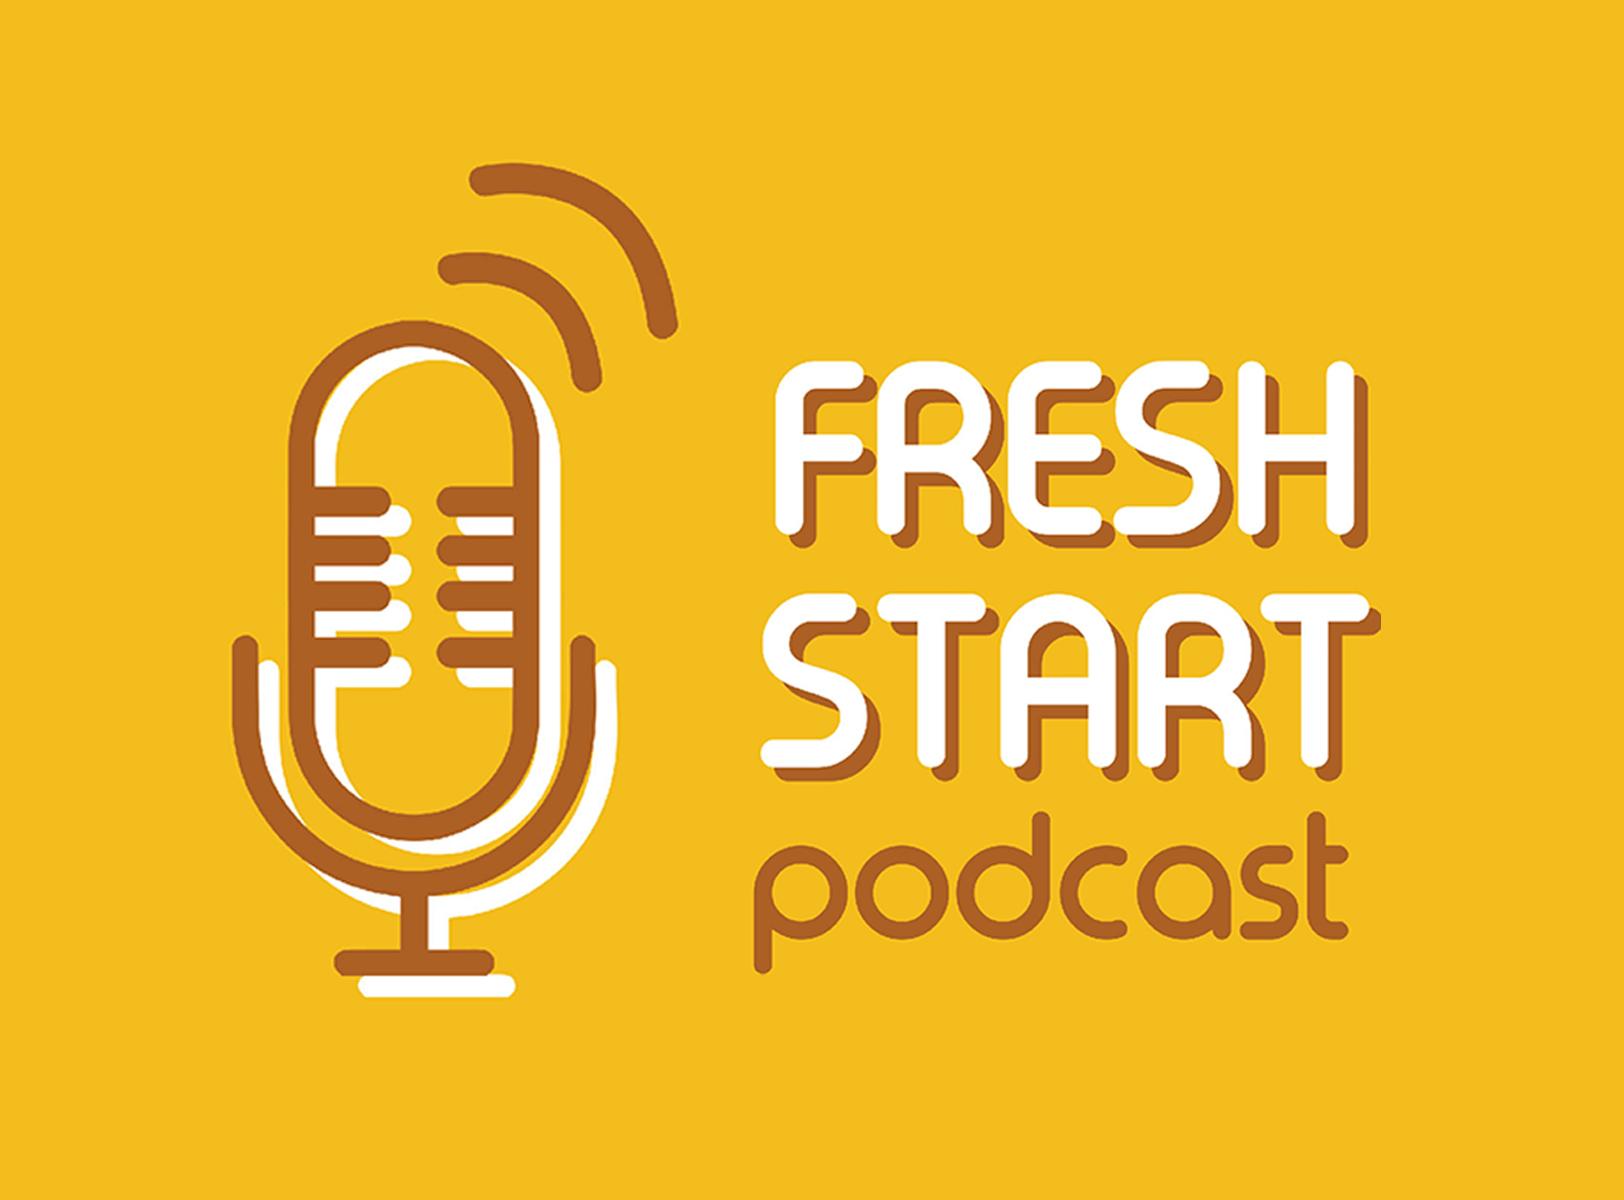 Fresh Start: Podcast News (4/16/2019 Tue.)